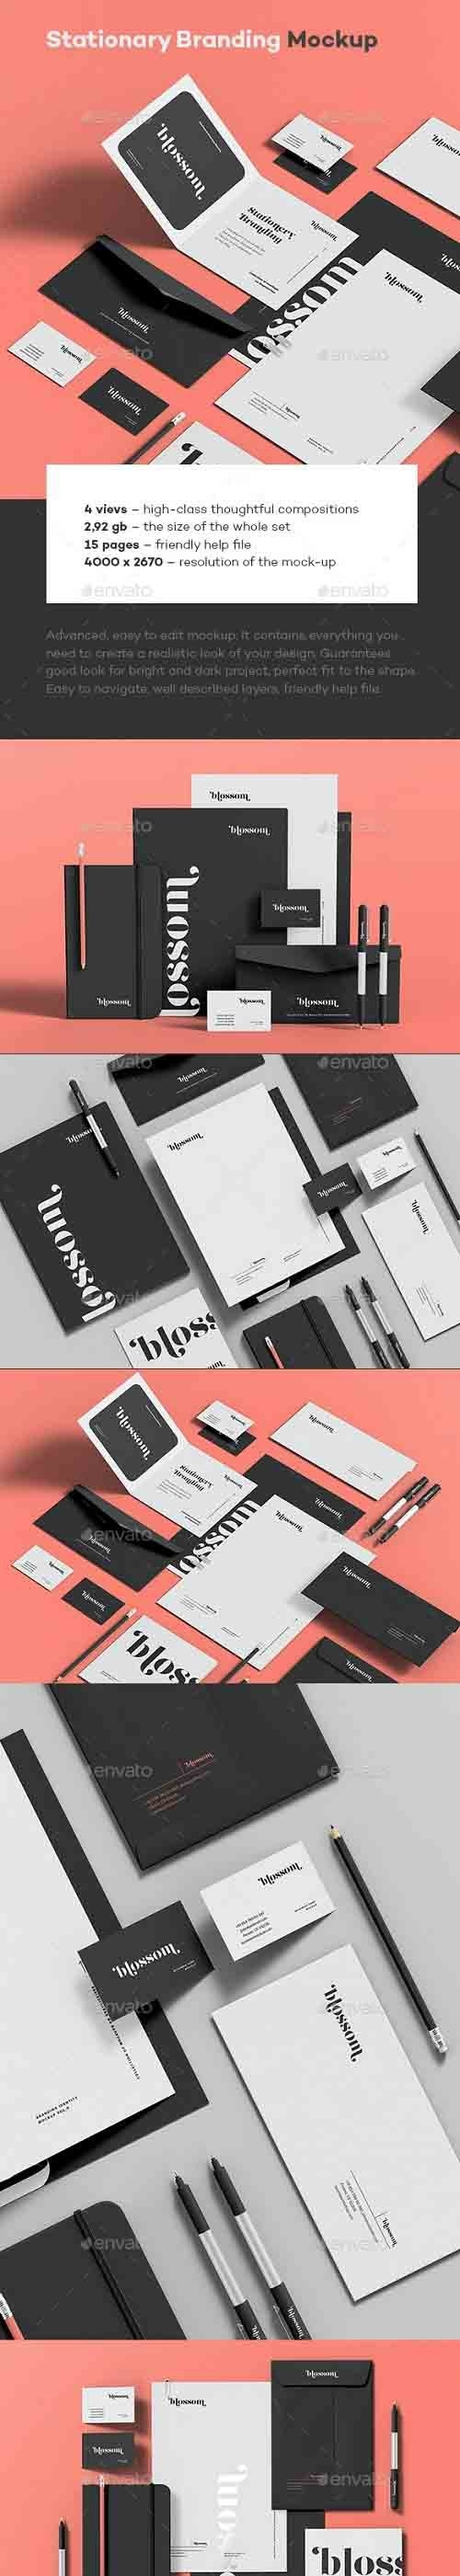 GraphicRiver - Stationary Branding Mock-up 9 30743894